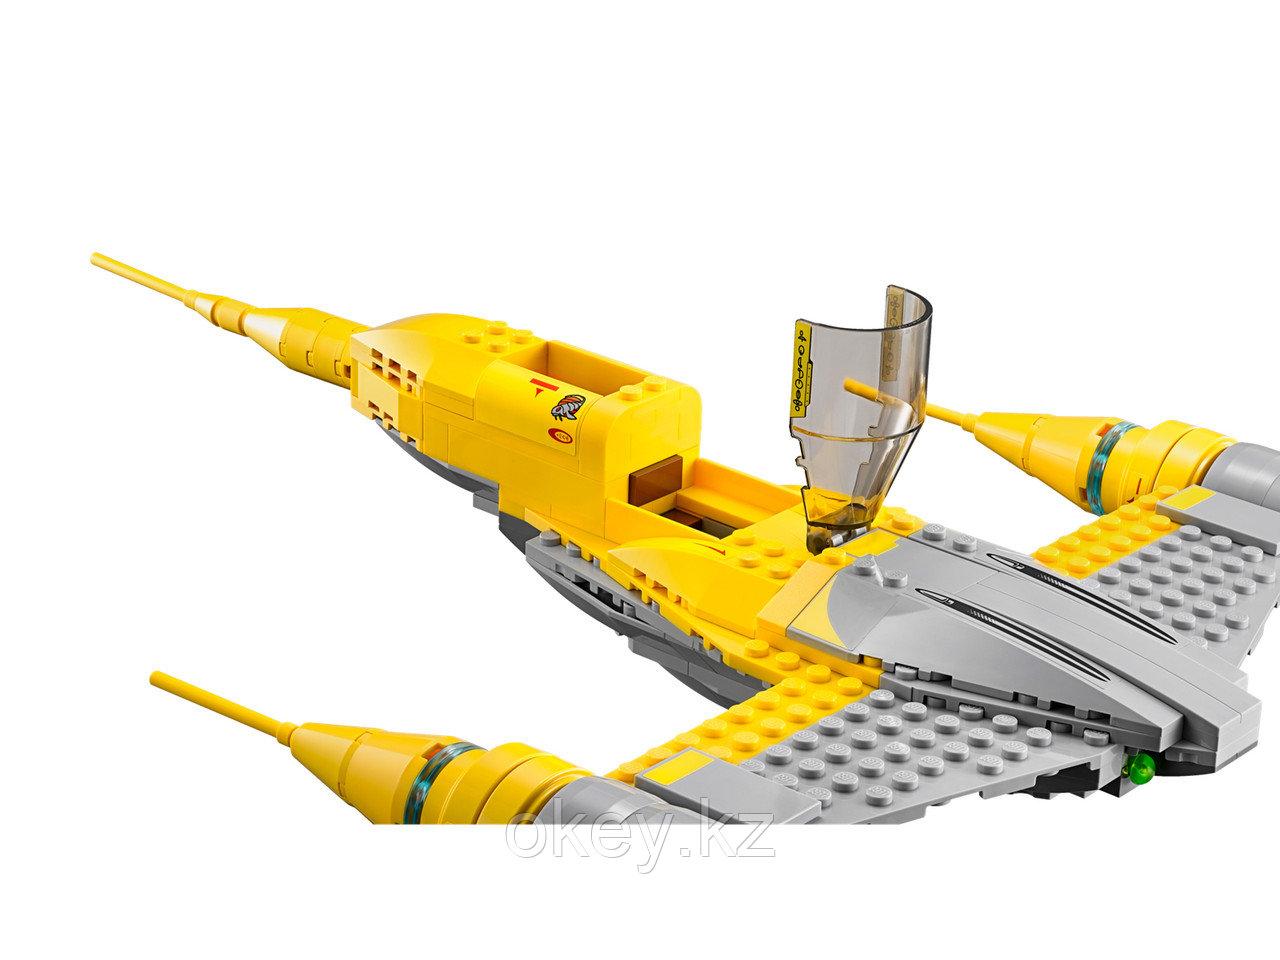 LEGO Star Wars: Истребитель Набу 75092 - фото 5